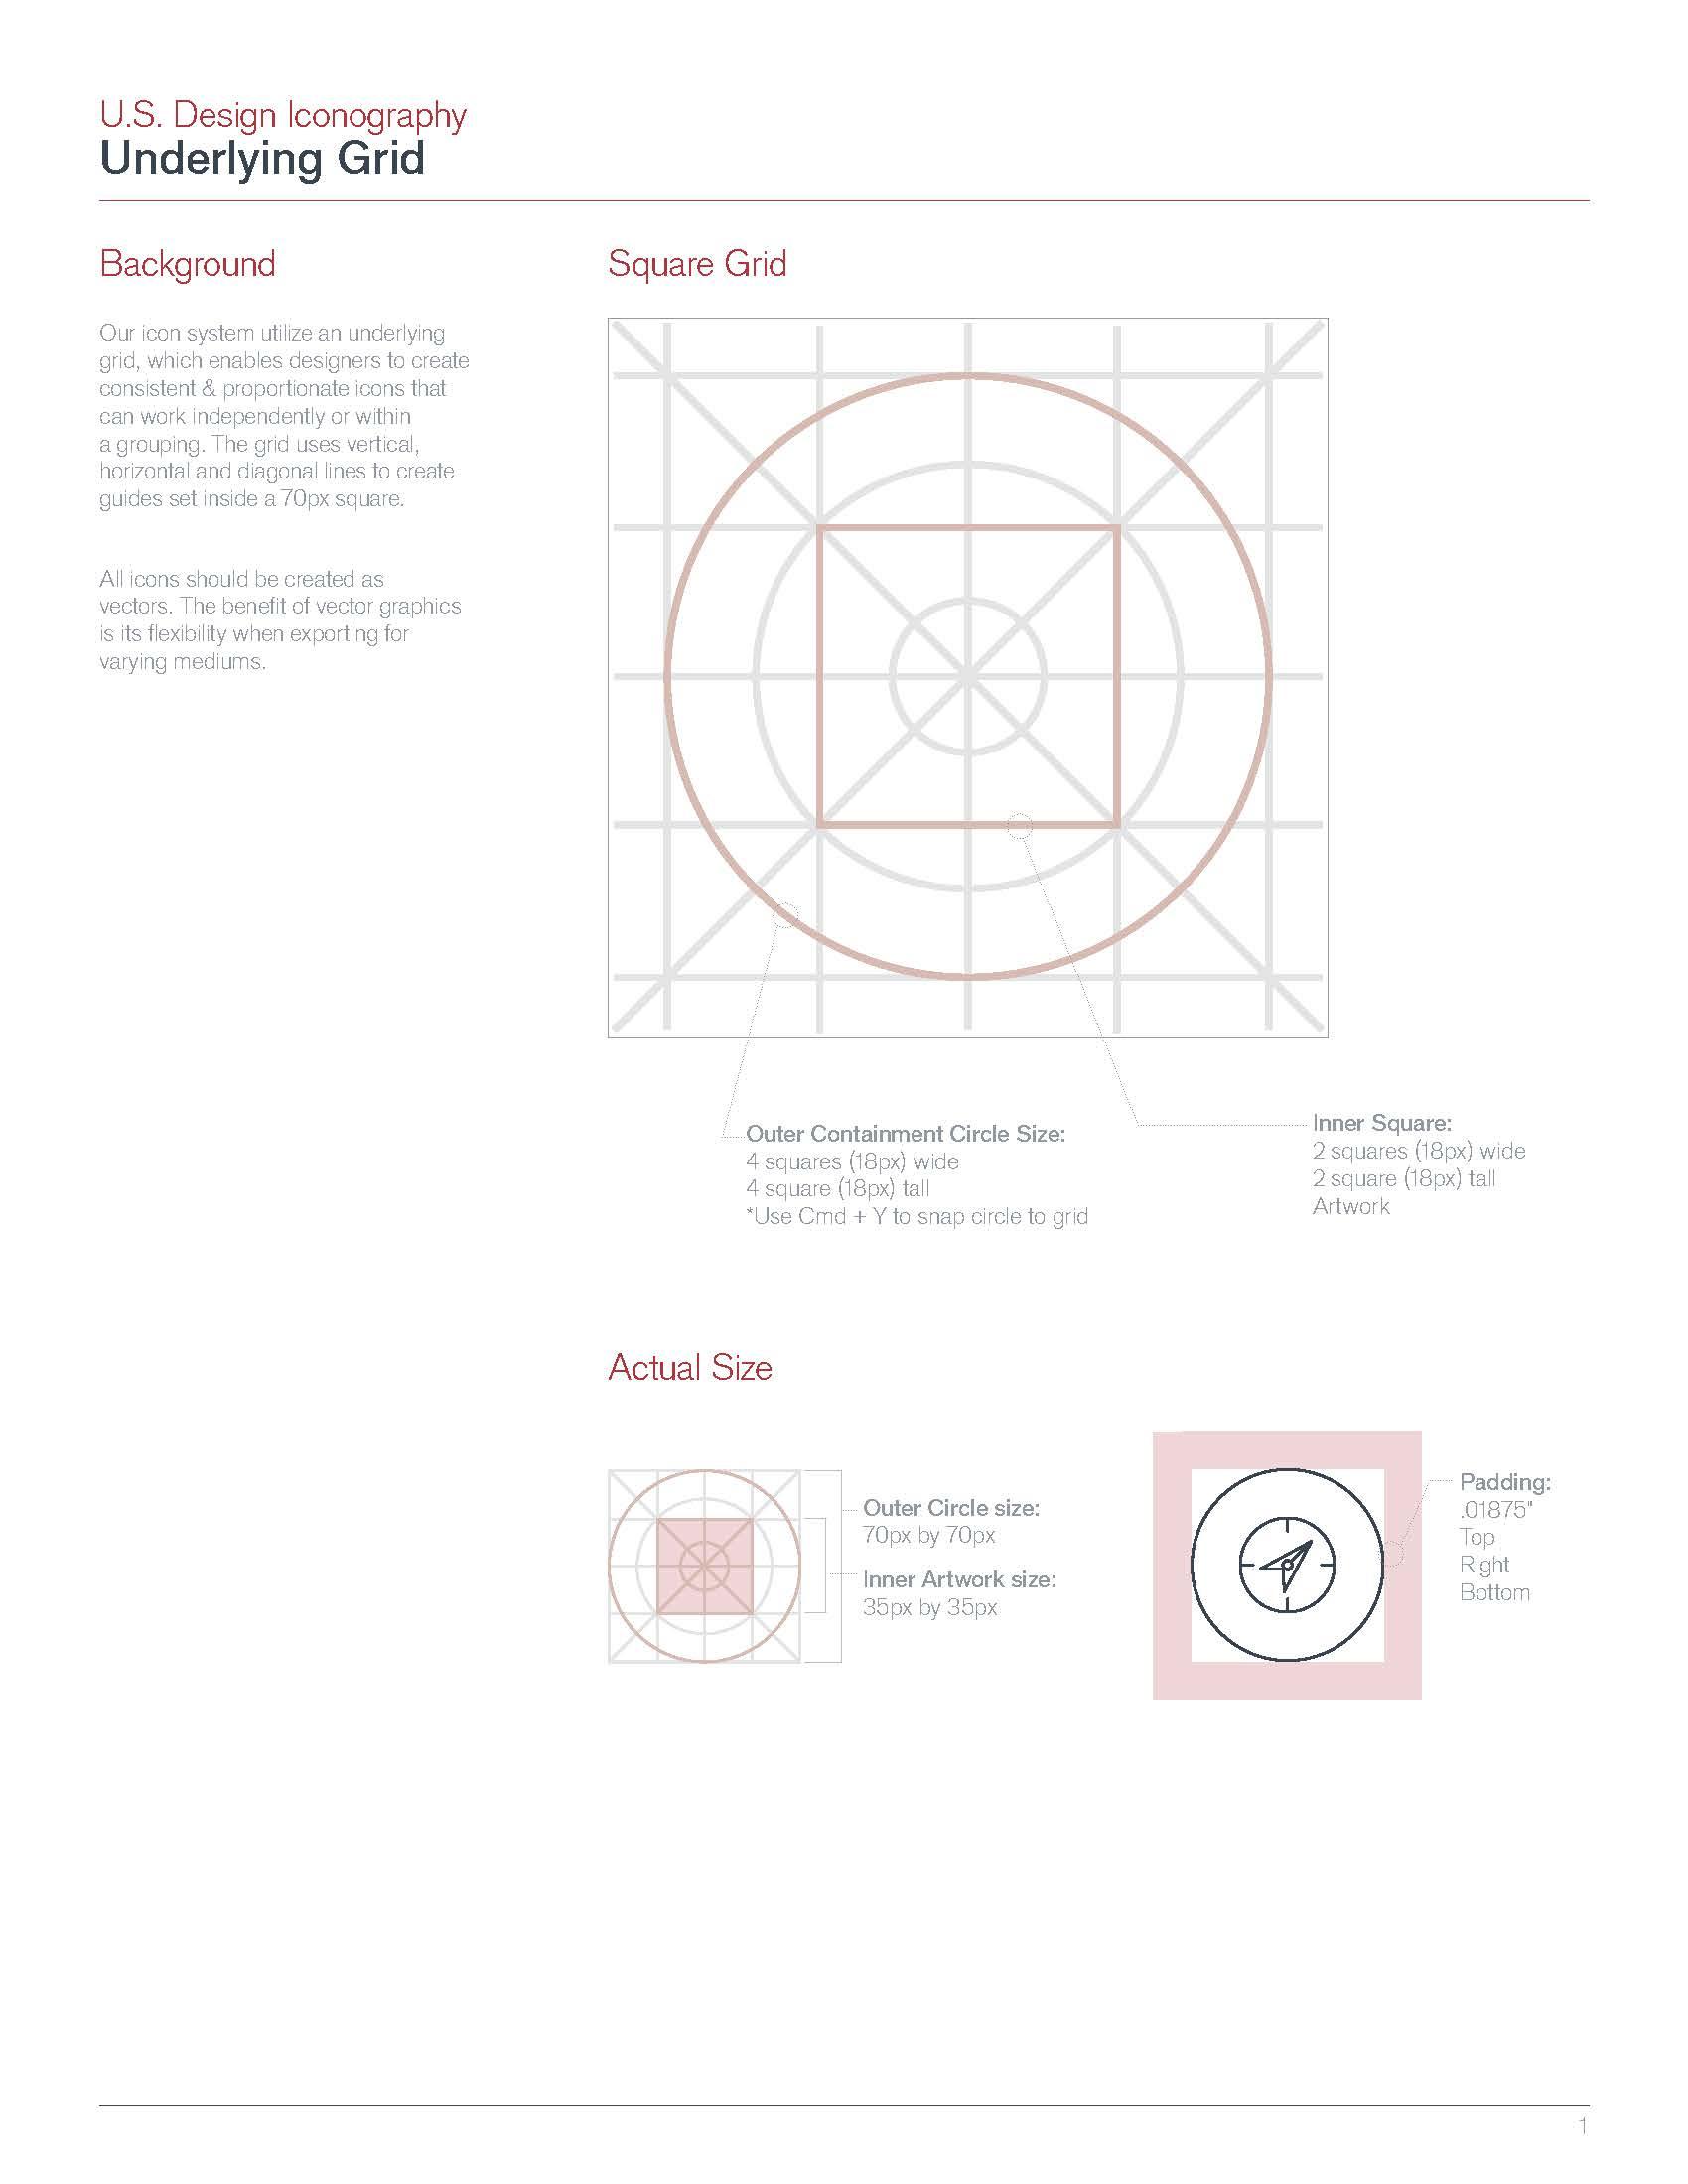 _JH_Design_Iconography_Draft4_Page_2.jpg